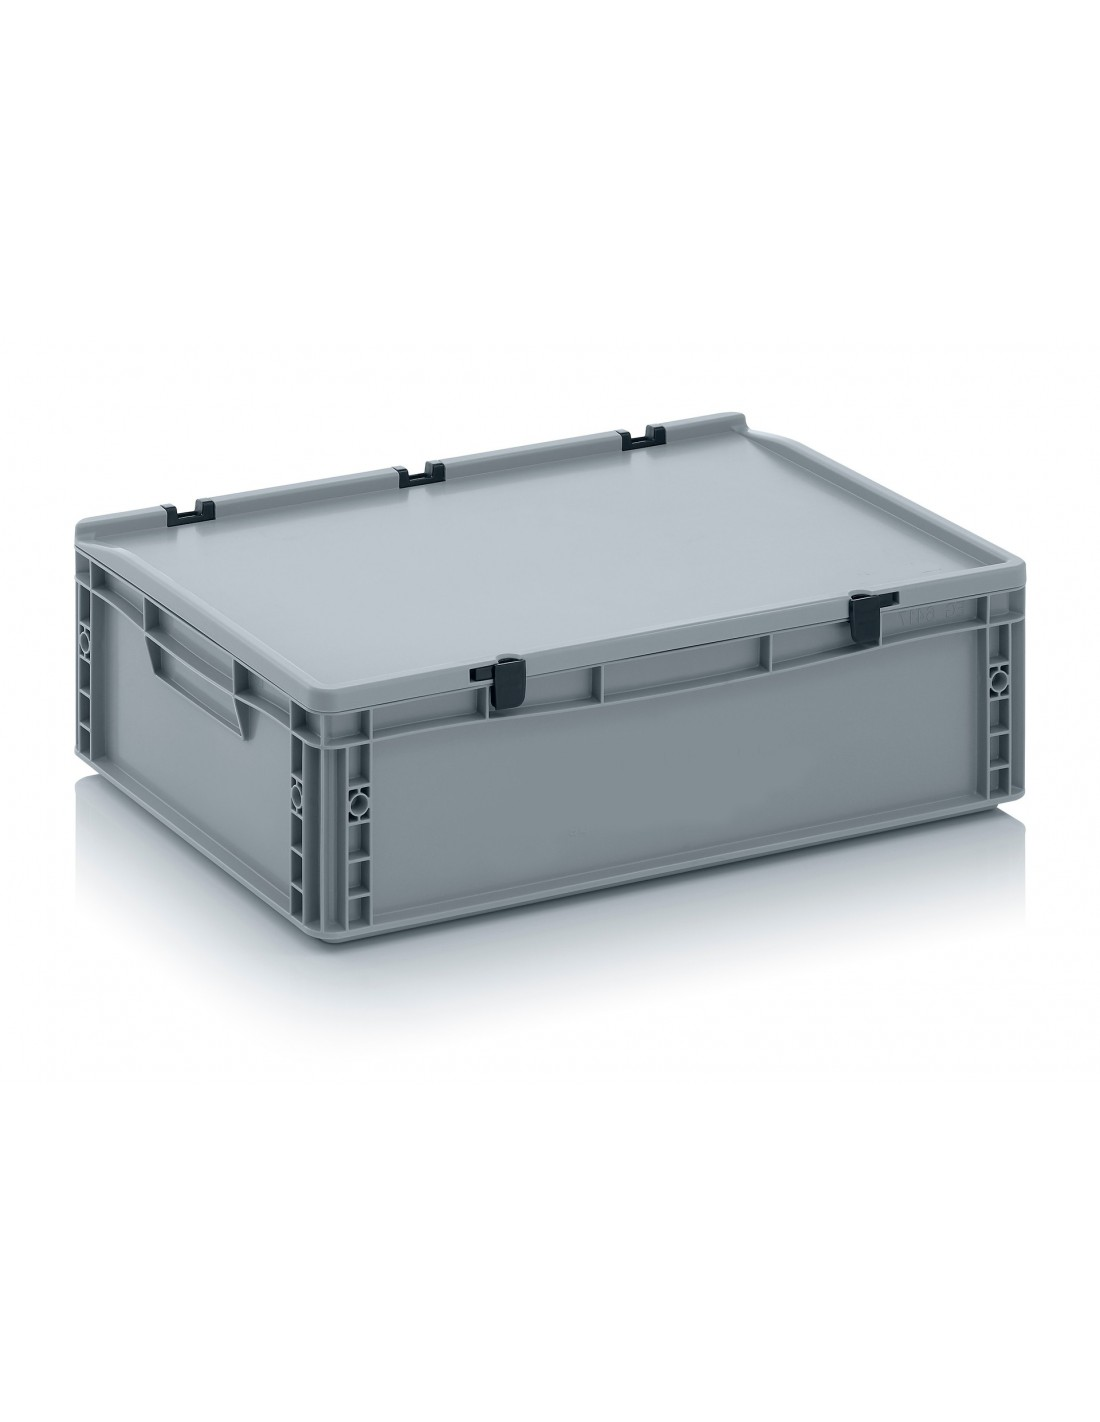 600 x 400 x 170 mm Eurobehälter Scharnierdeckel